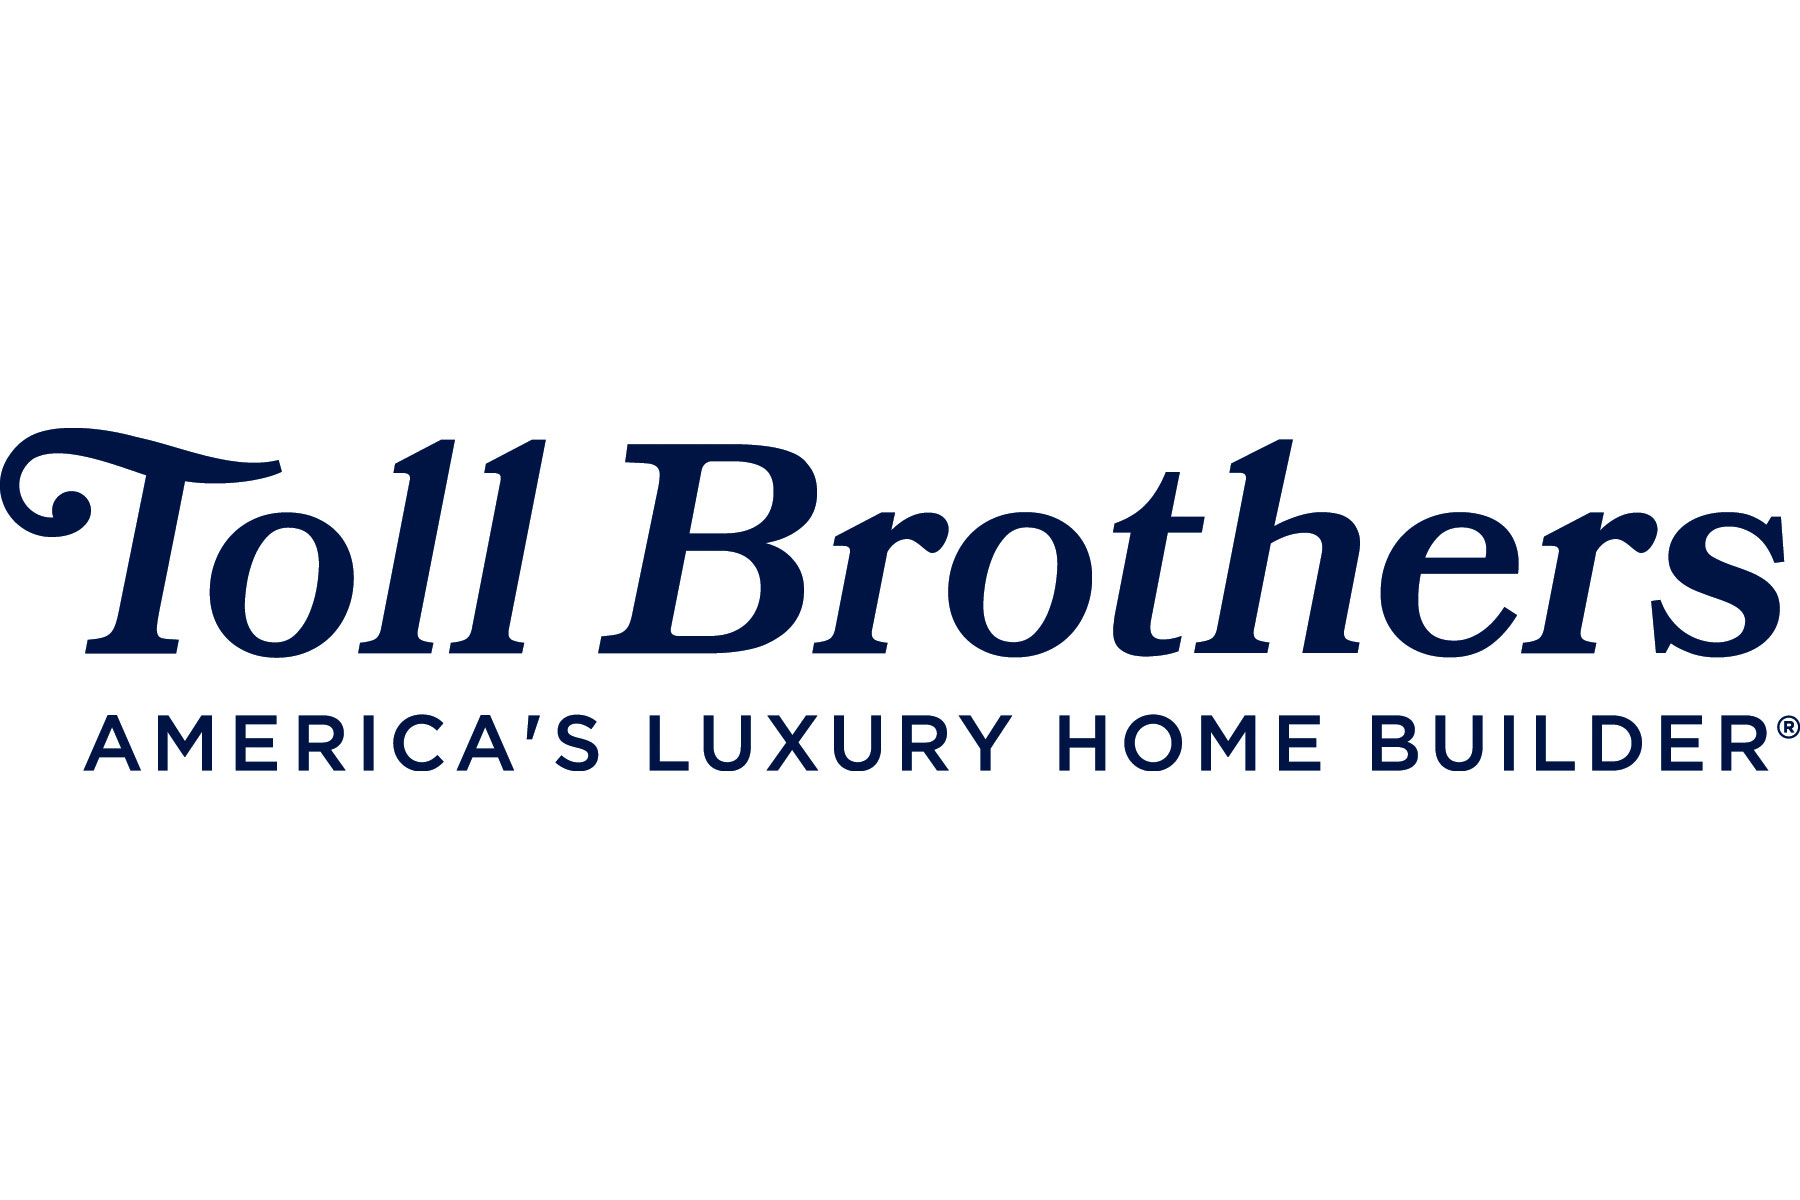 tollbrothers-logo.jpg